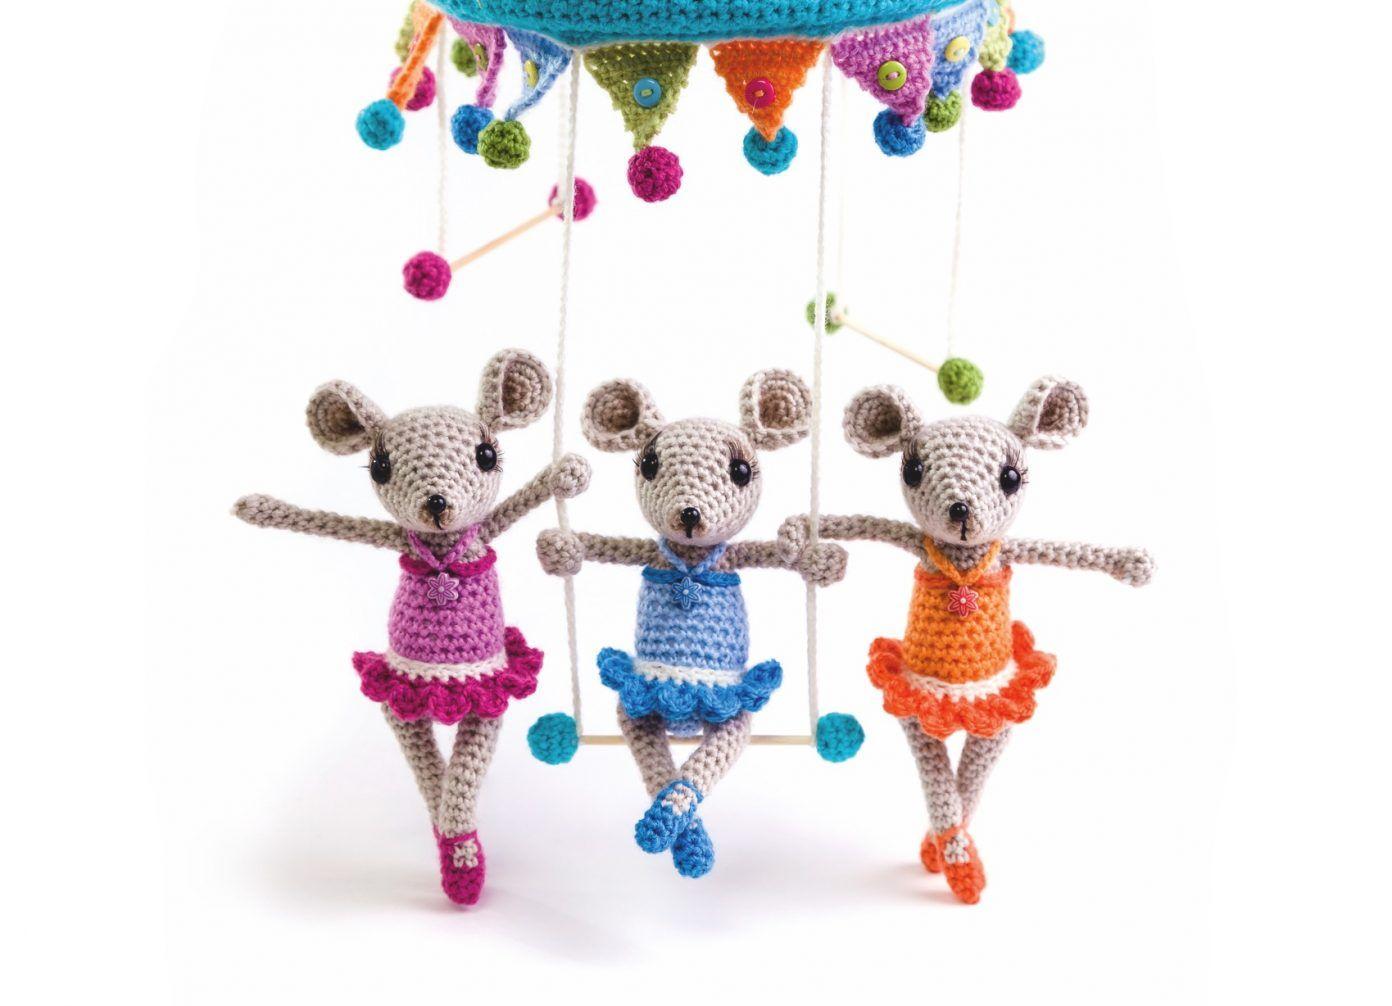 Das Trapez-Trio als Kinder-Mobile   Kinder mobile, Trapez und Mobiles